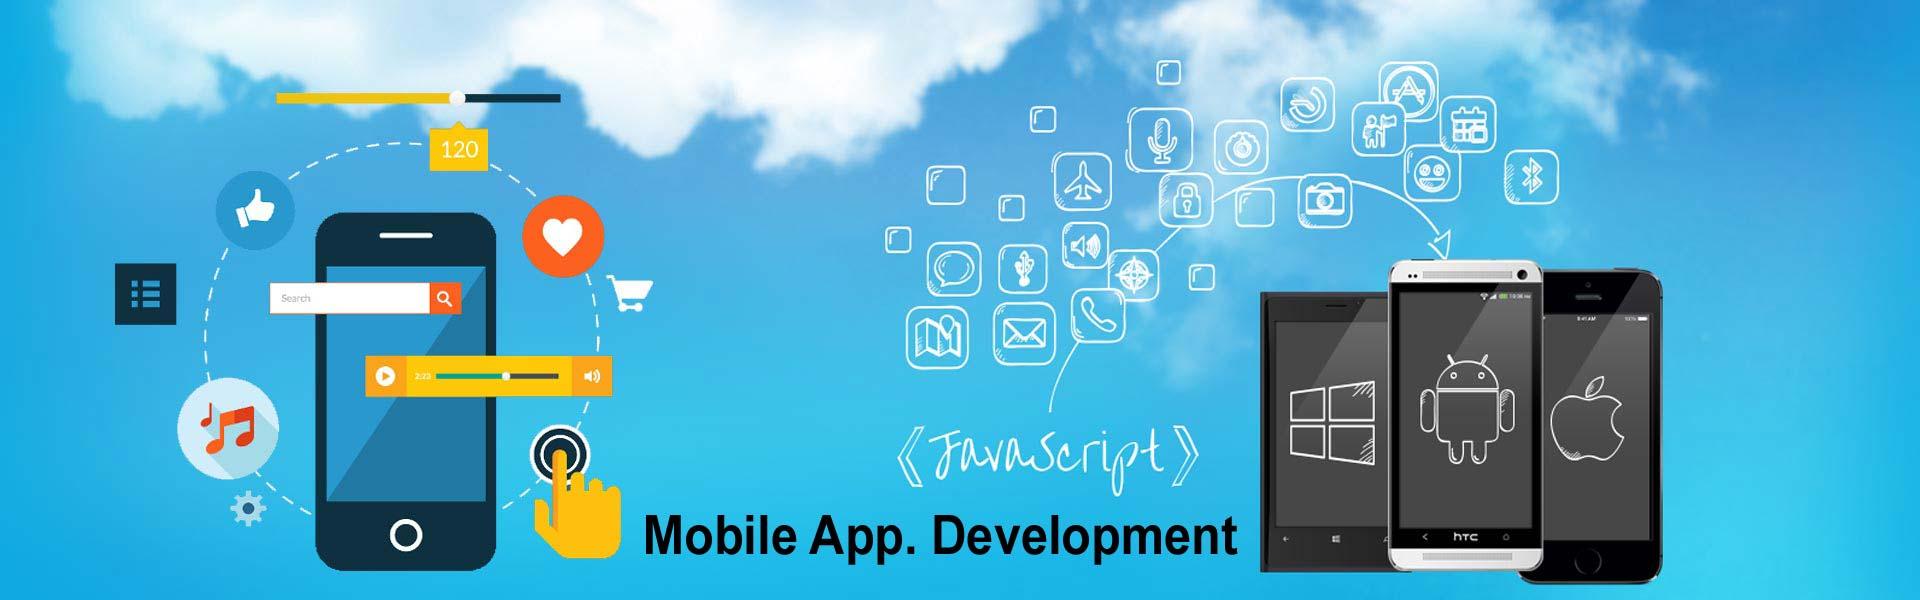 Mobile App. Development